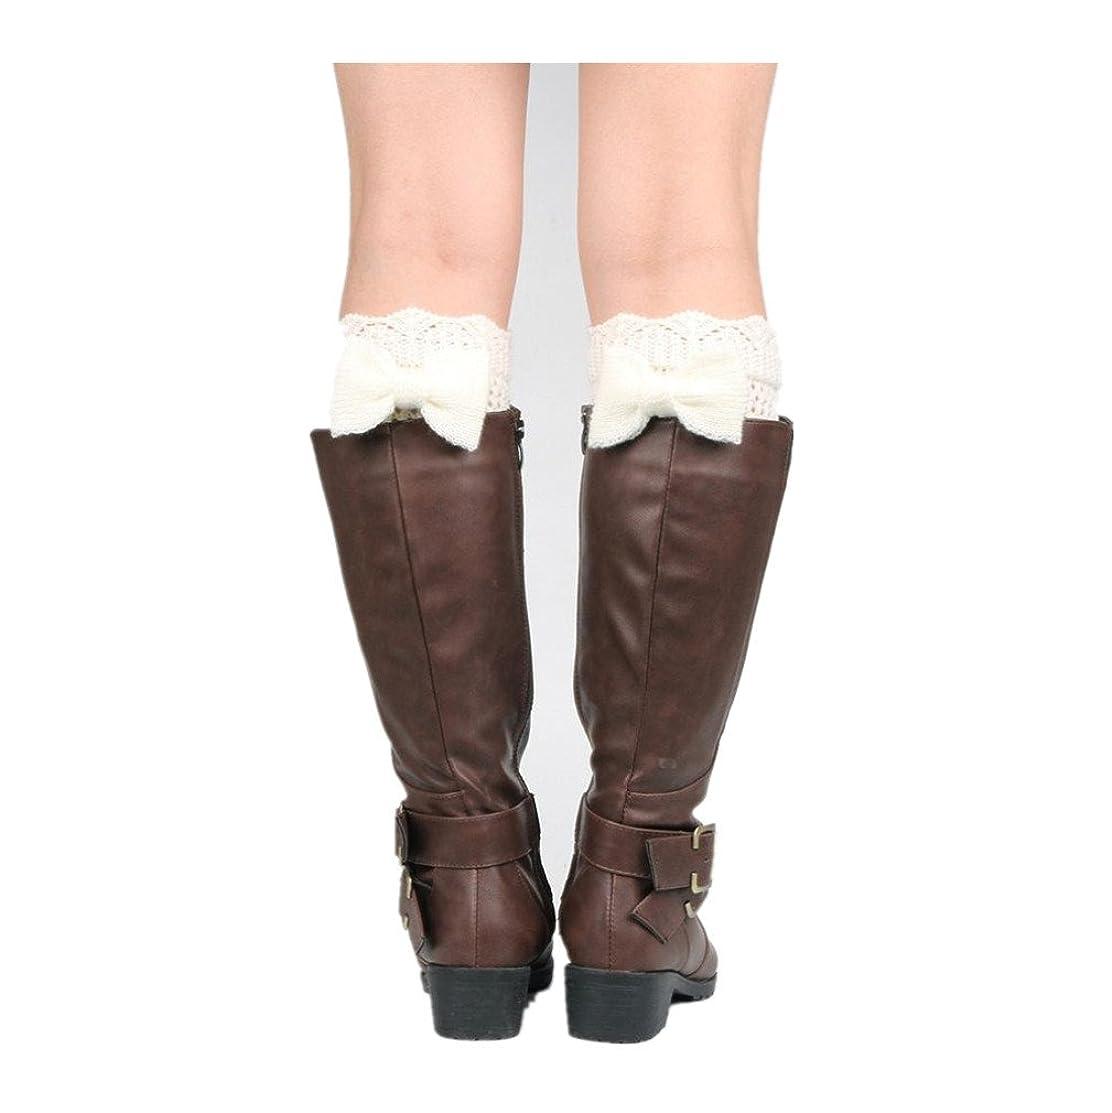 GBSELL Fashion Women Short Bow Lace Boot Socks Leg Cuffs Leg Warmers